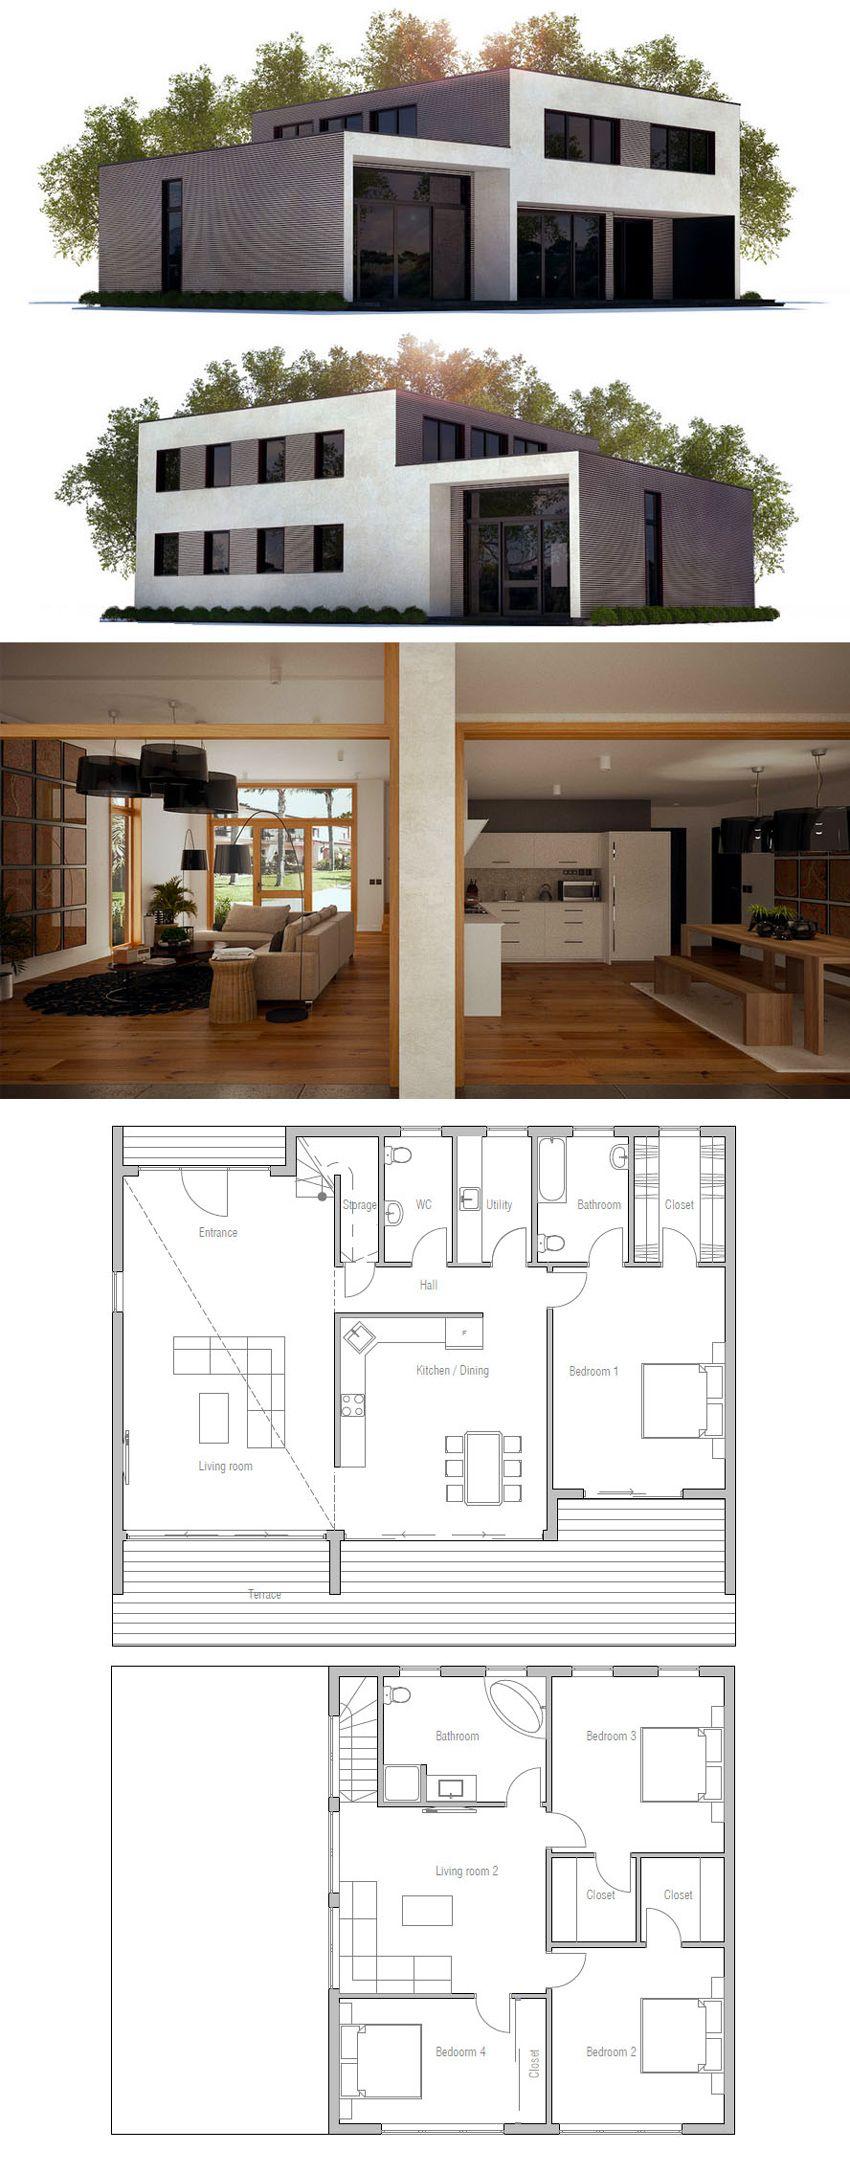 House Plan Ch251 House Plans Minimalist House Design Small House Plans